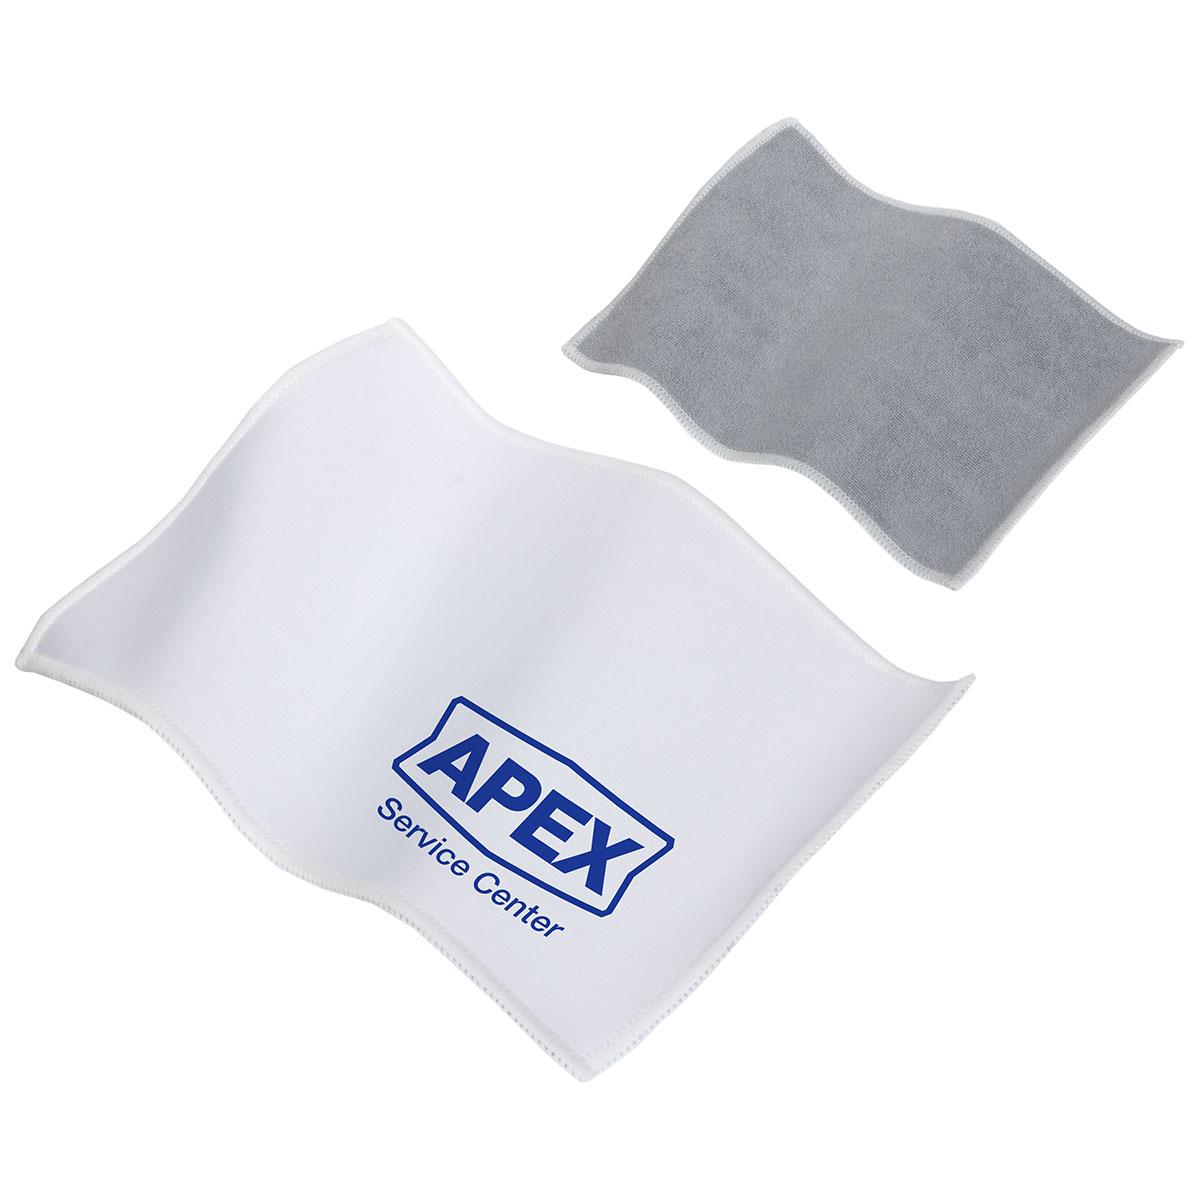 Quick Clean Dual Sided Microfiber Cloth, WPC-QC13, 1 Colour Imprint